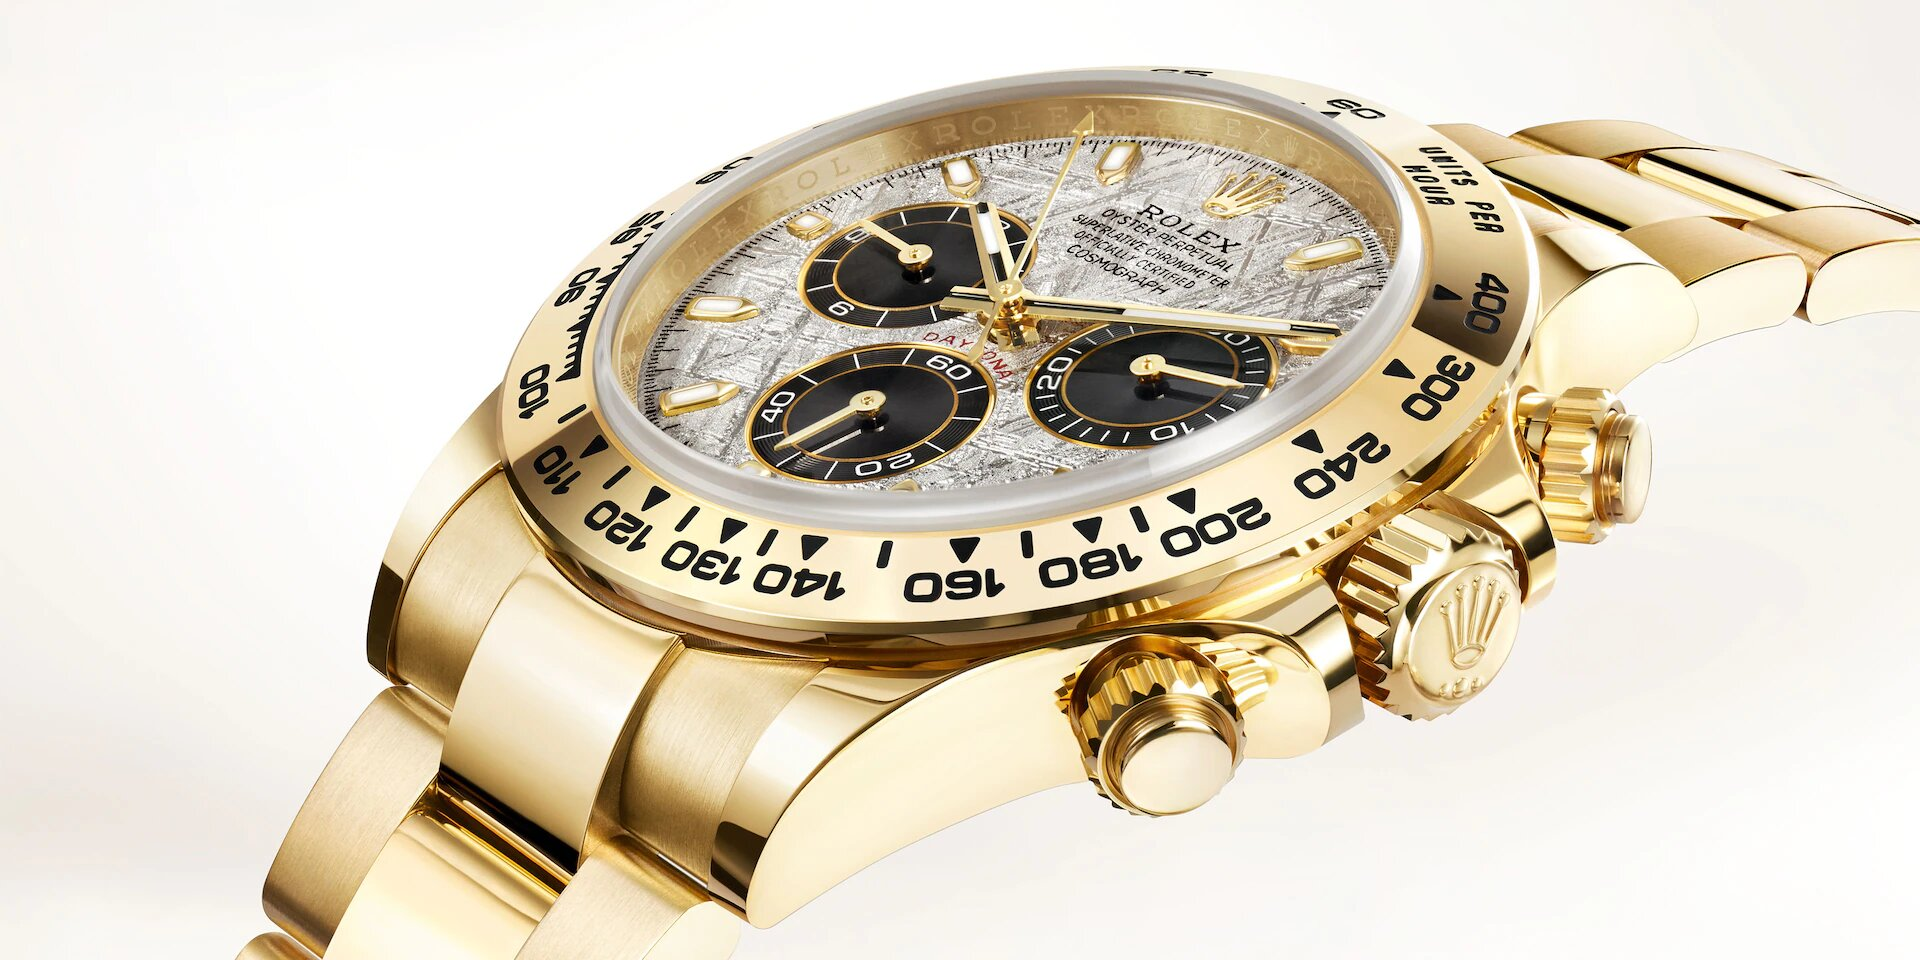 Rolex Cosmograph Daytona 116508